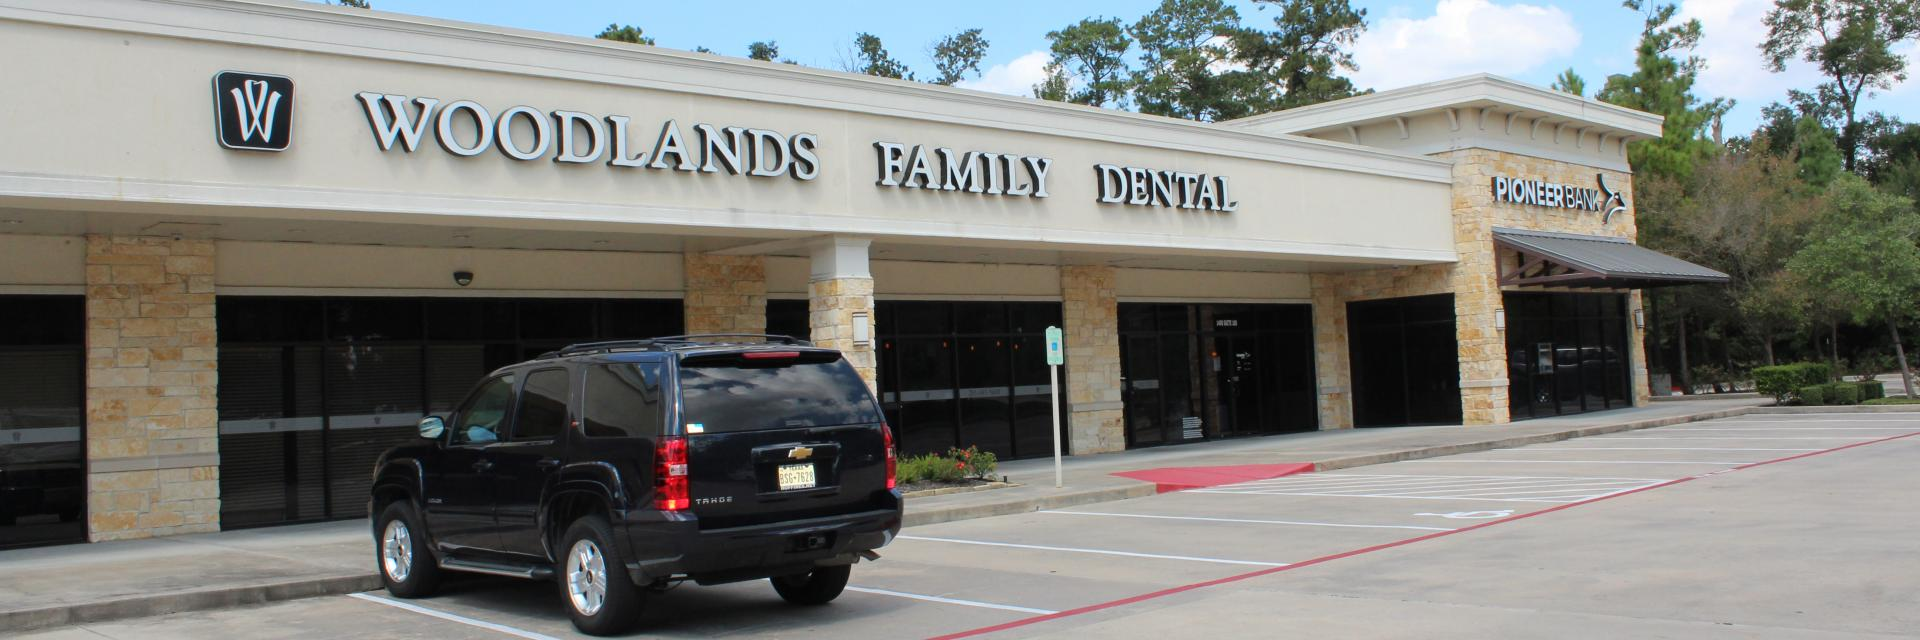 woodlands_family_dental.jpg